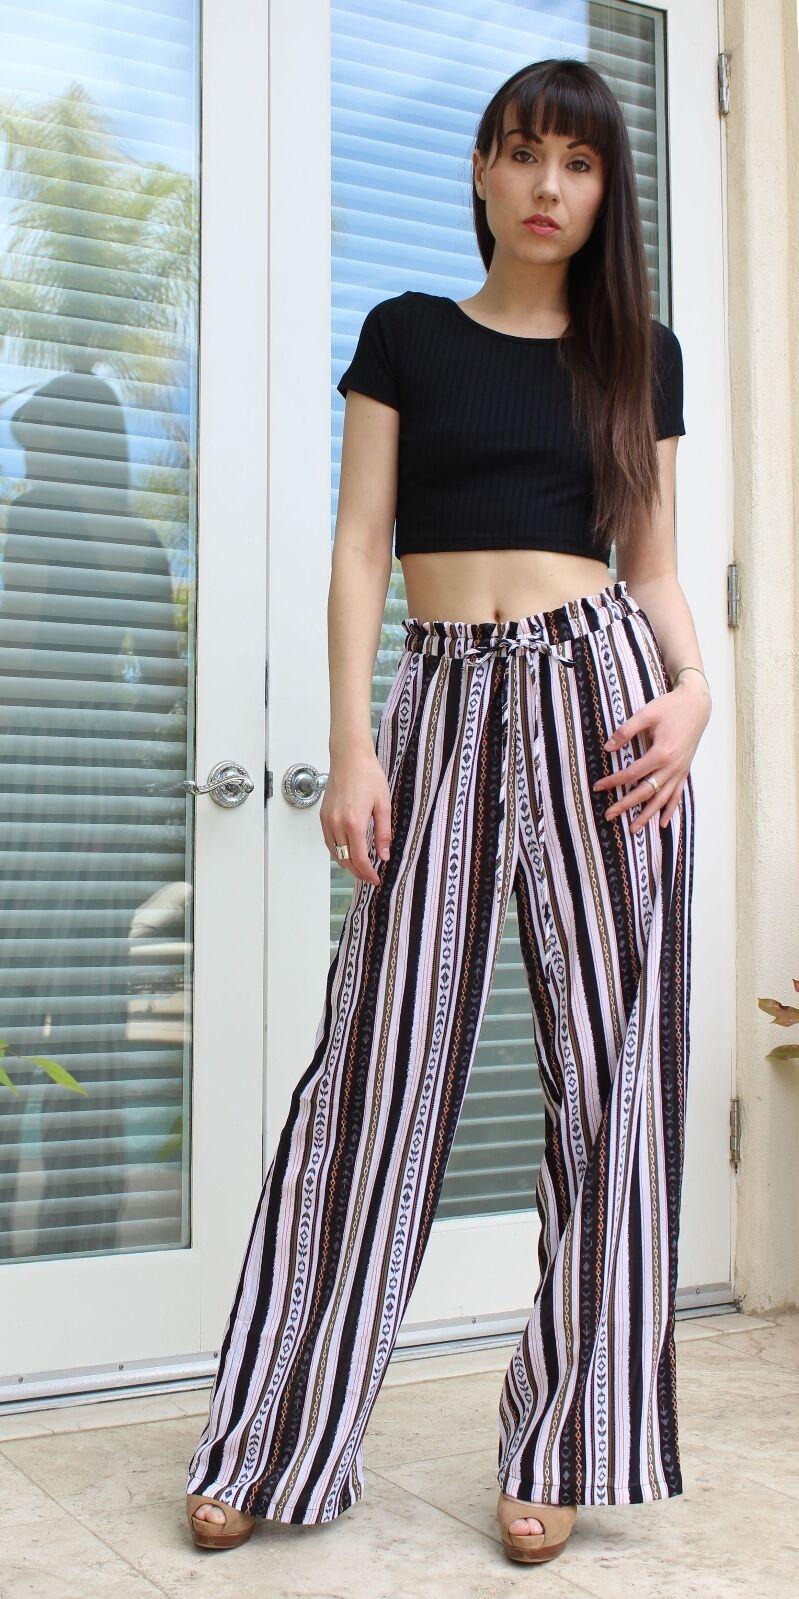 SAVE  20 EXTRA Aztec Print Casual Pants   Wide Leg S M L Lola Y5083